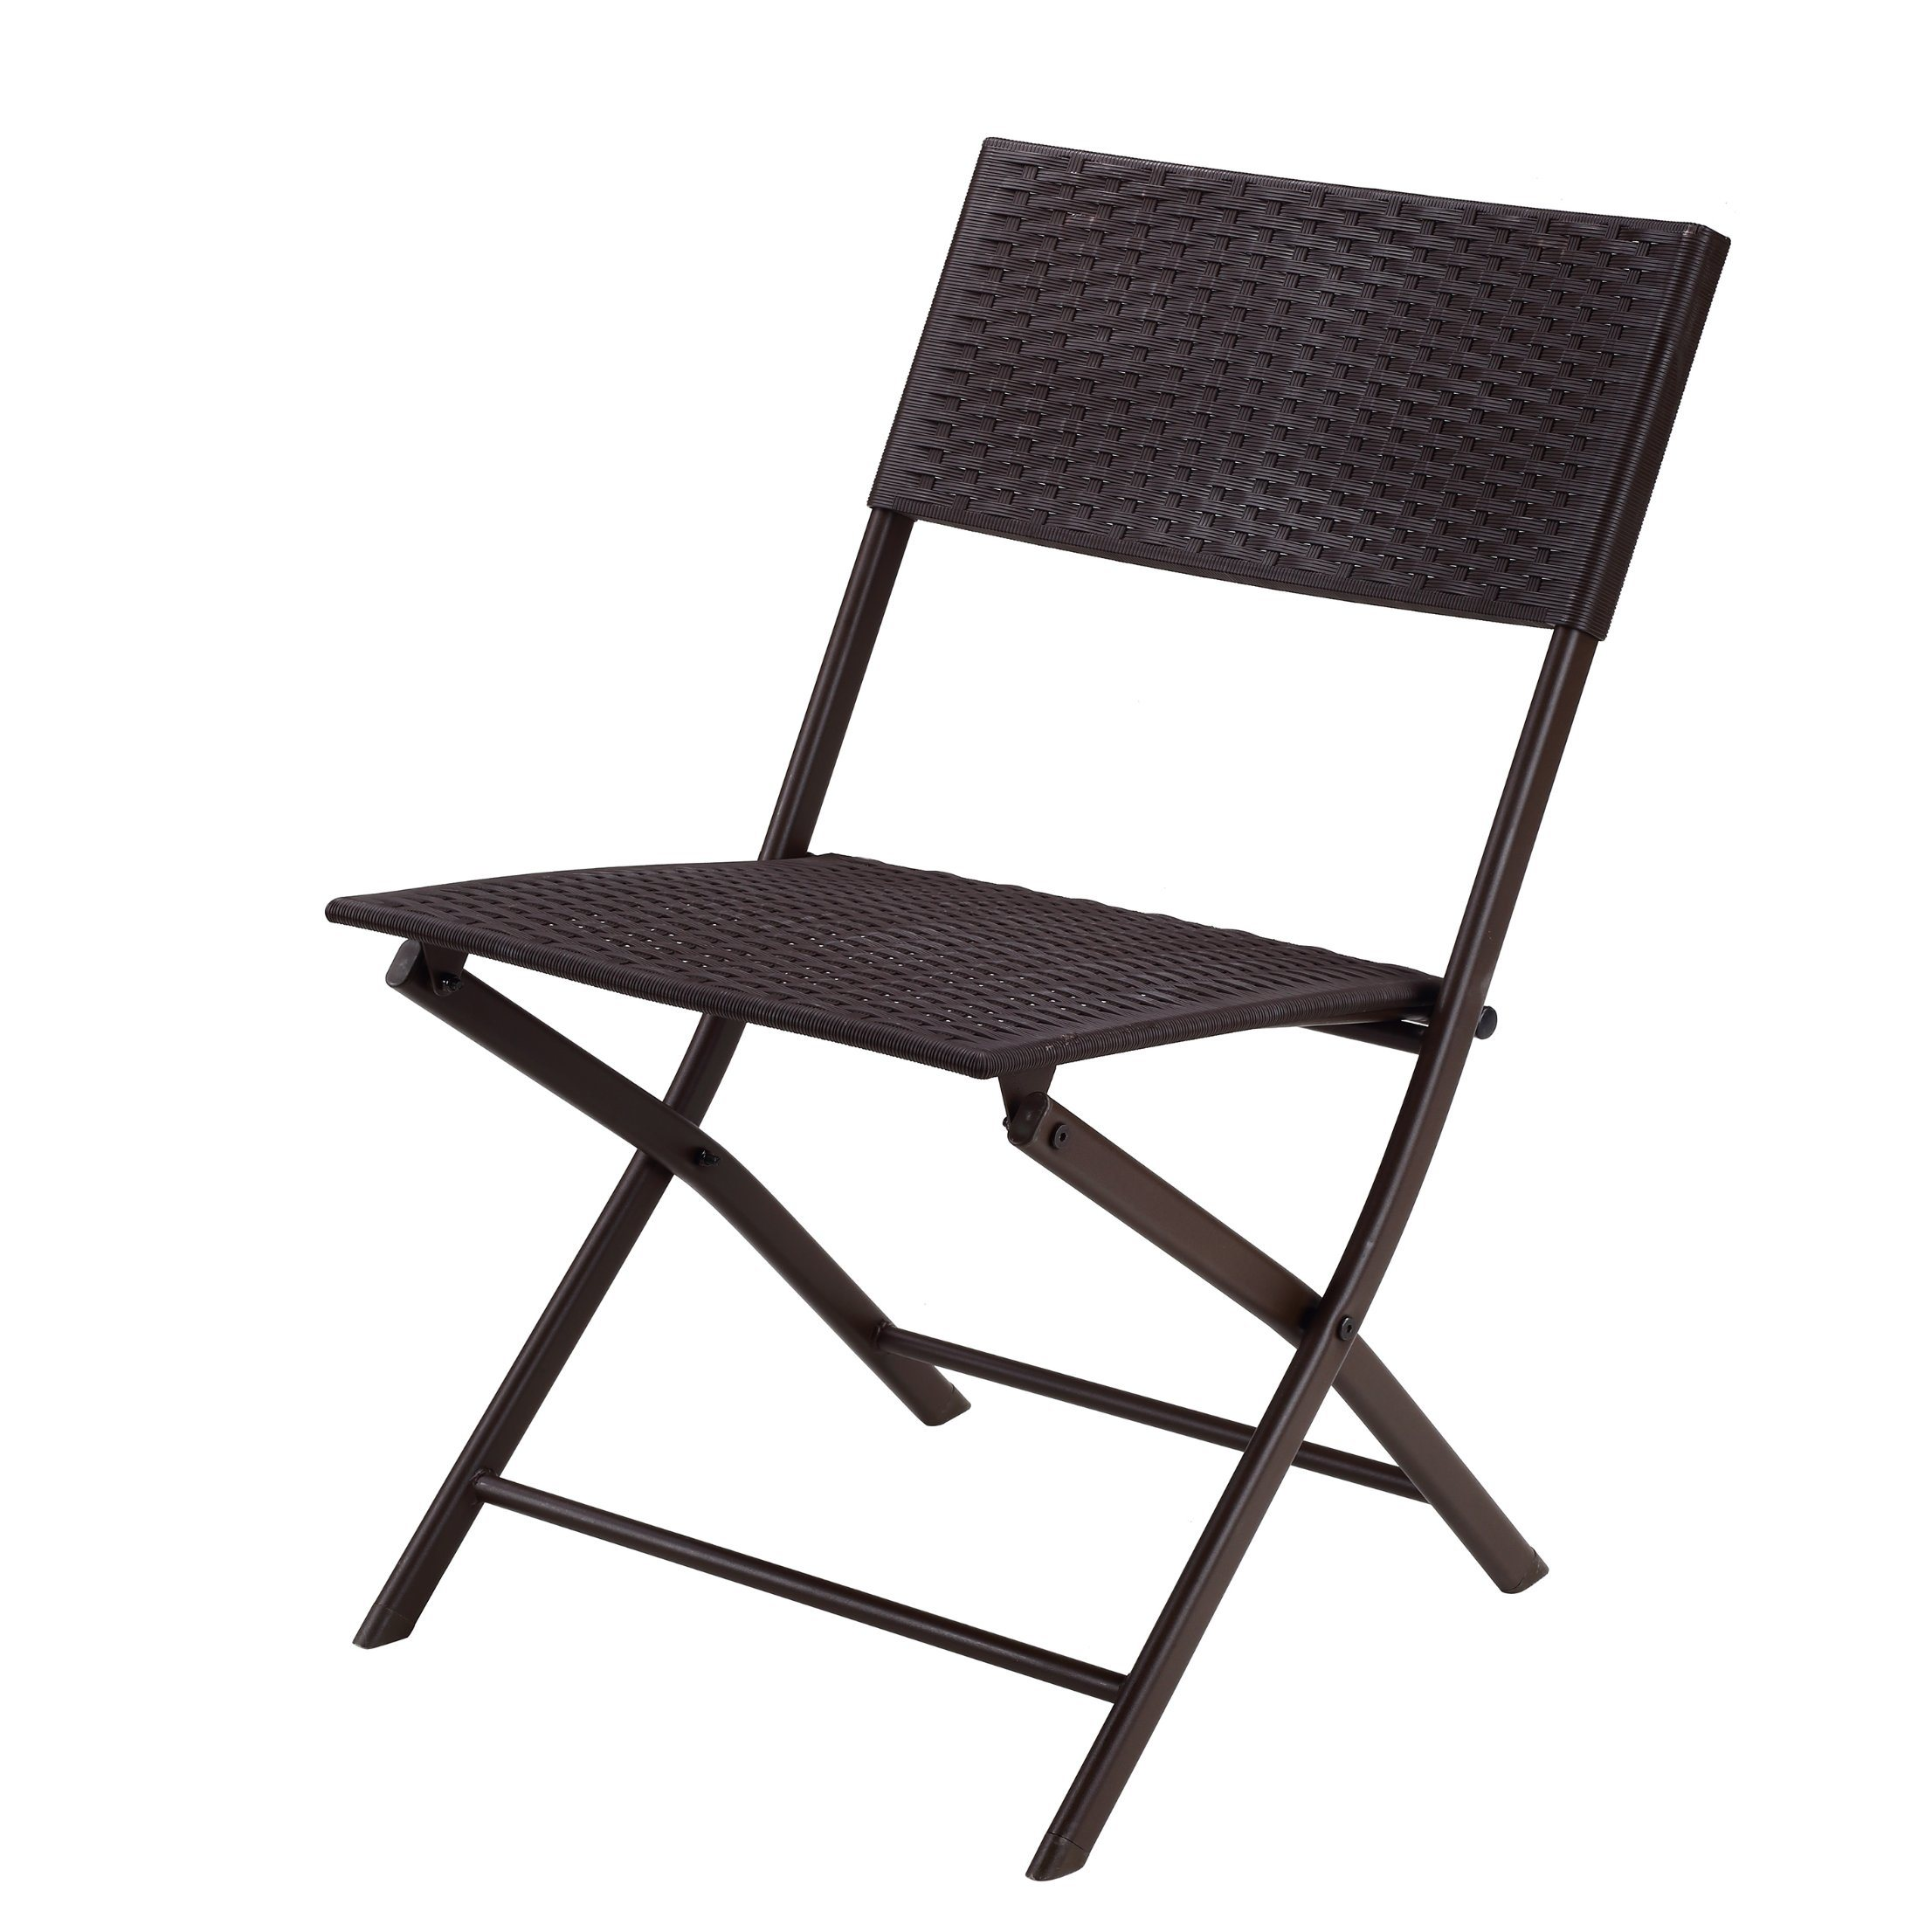 [Hot Item] Garden Event Foldable Plastic Chair Portable Lifetime Cheap  Outdoor Patio Furniture Black Plastic Folding Chairs